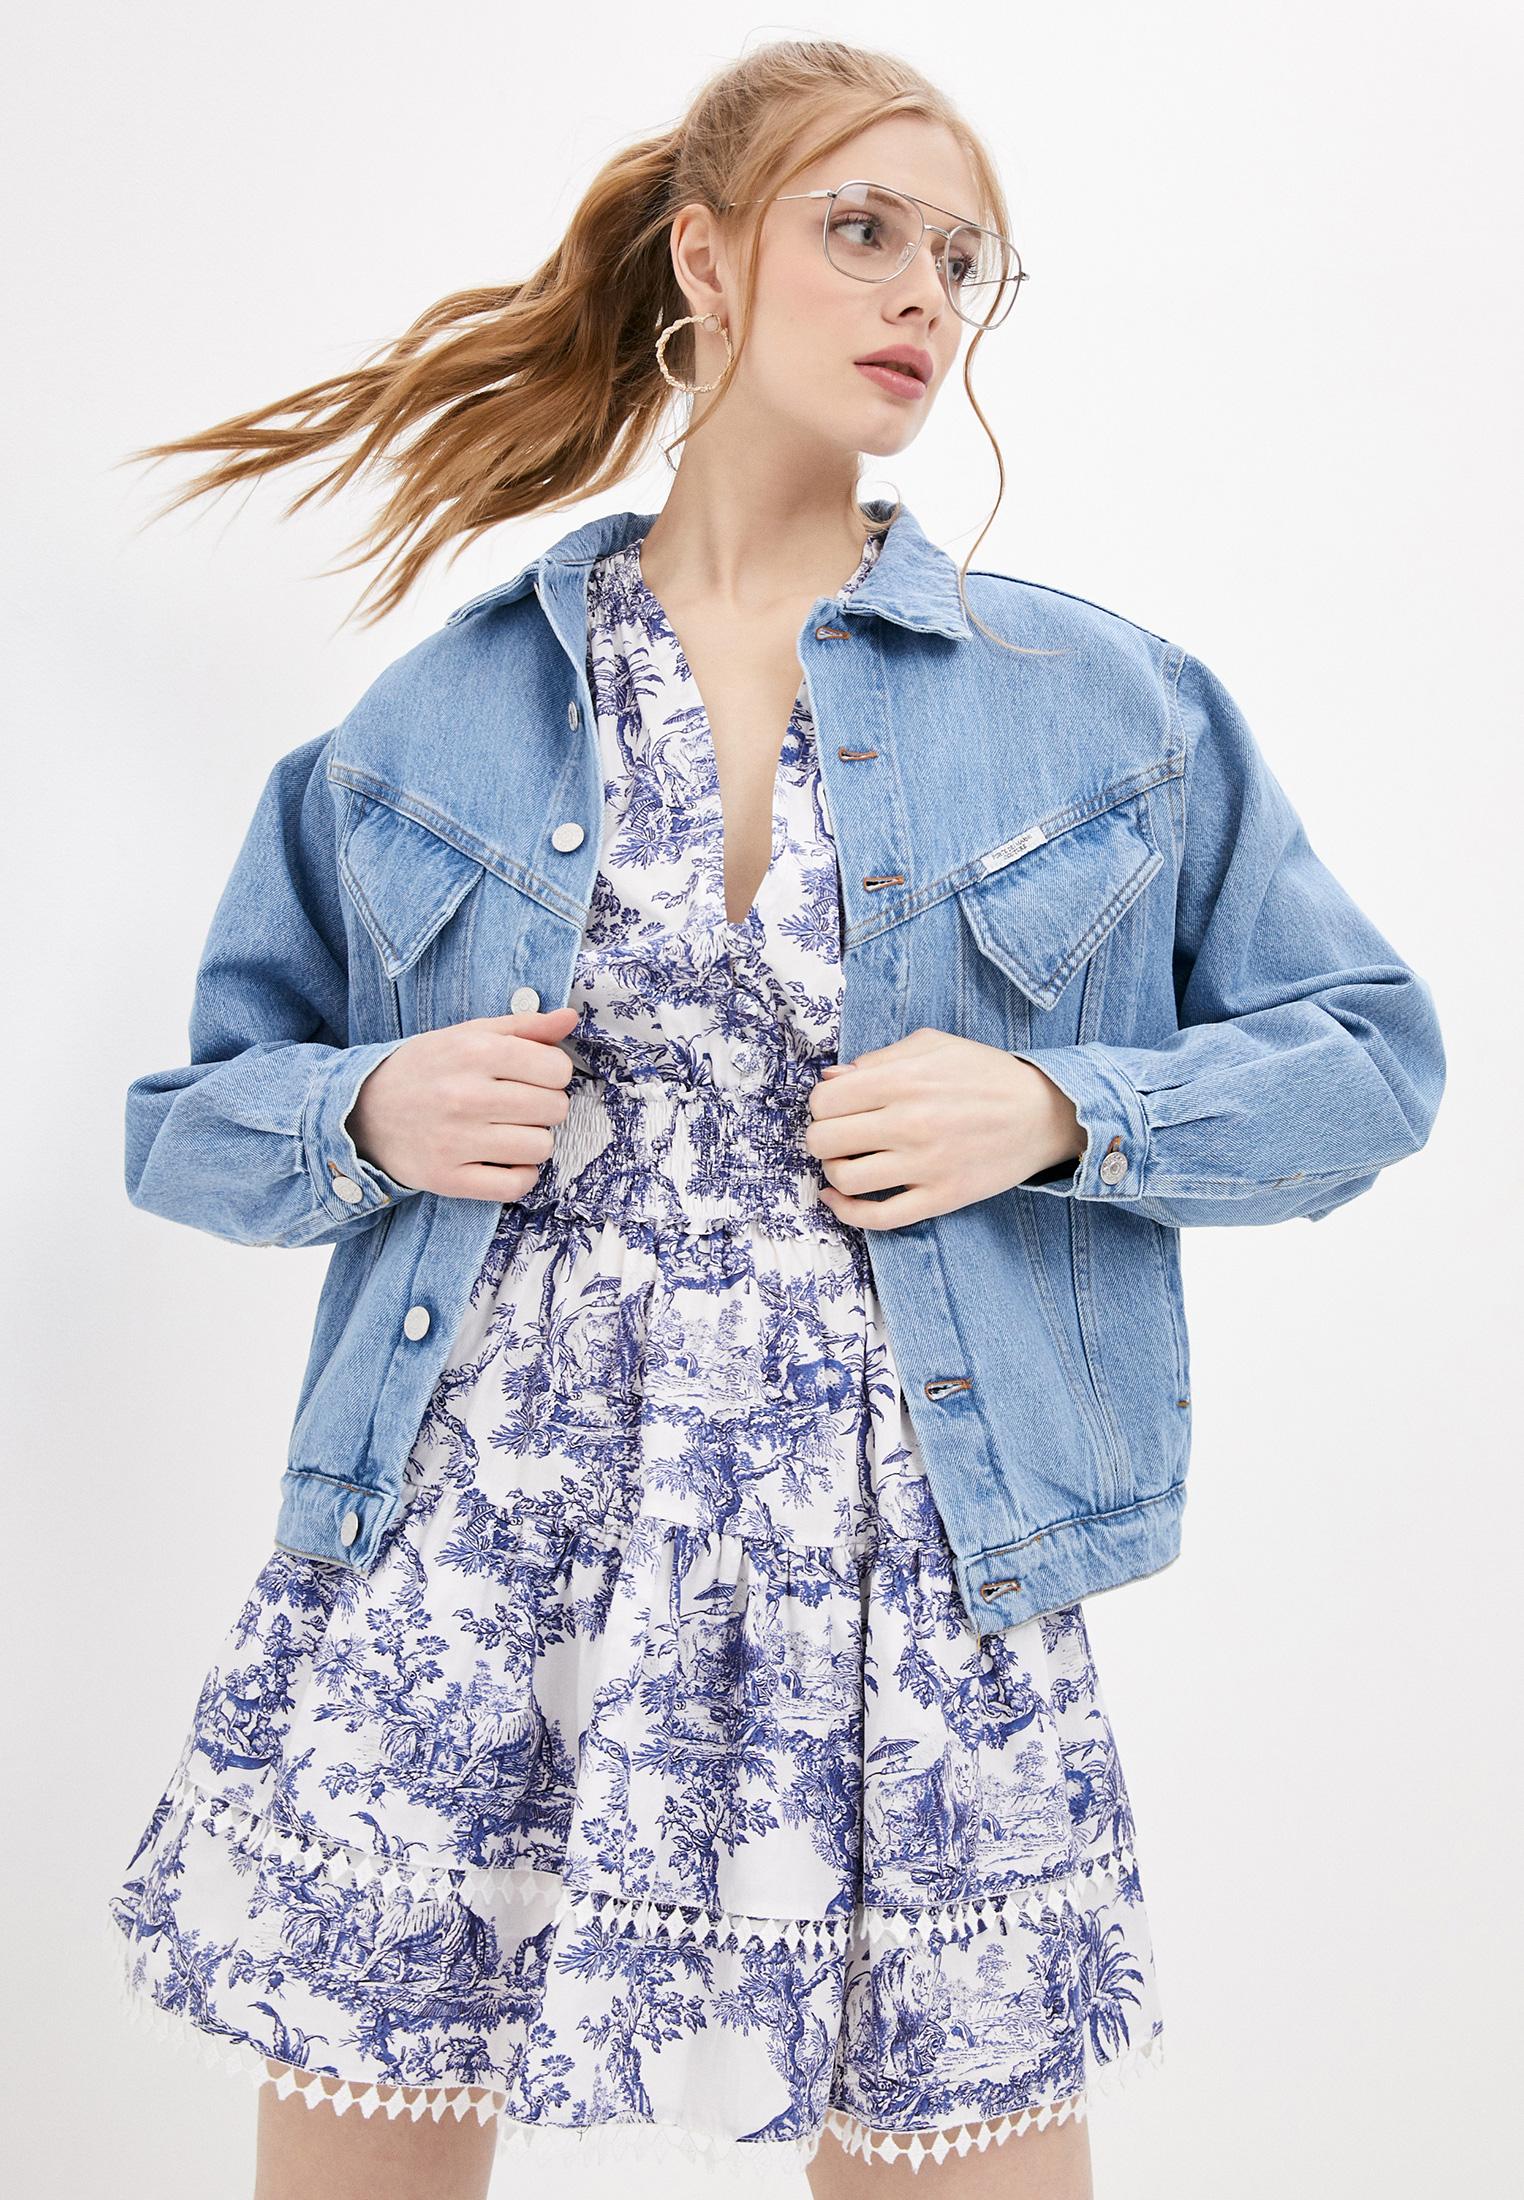 Джинсовая куртка Forte Dei Marmi Couture Куртка джинсовая Forte Dei Marmi Couture